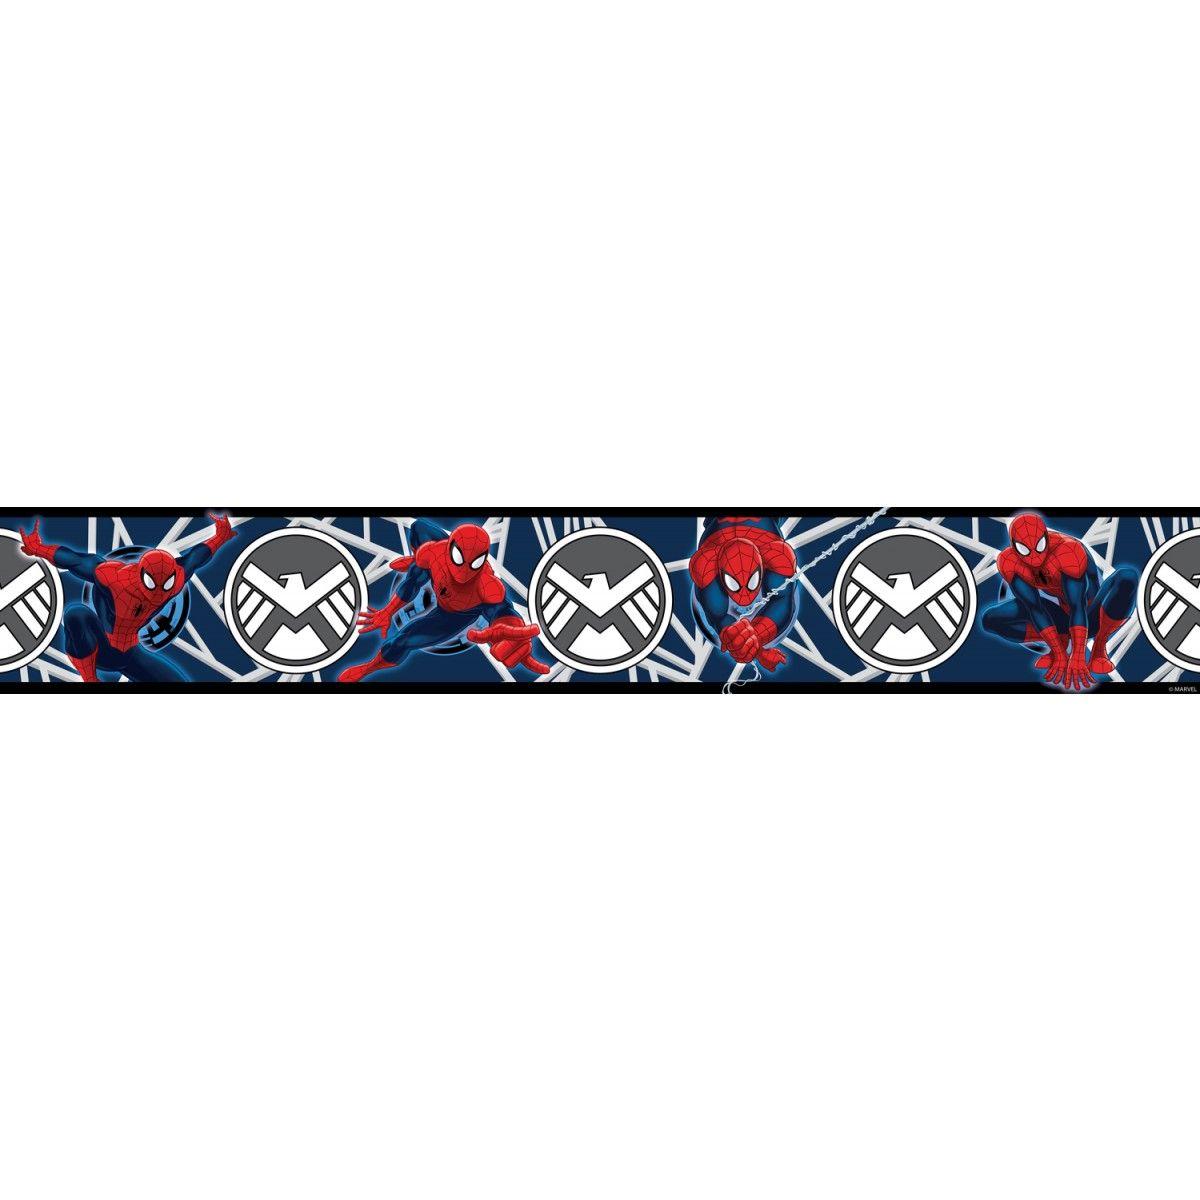 Disney Cars Wallpaper Border Uk Spiderman Blue Self Adhesive Wallpaper Border 5m Boys